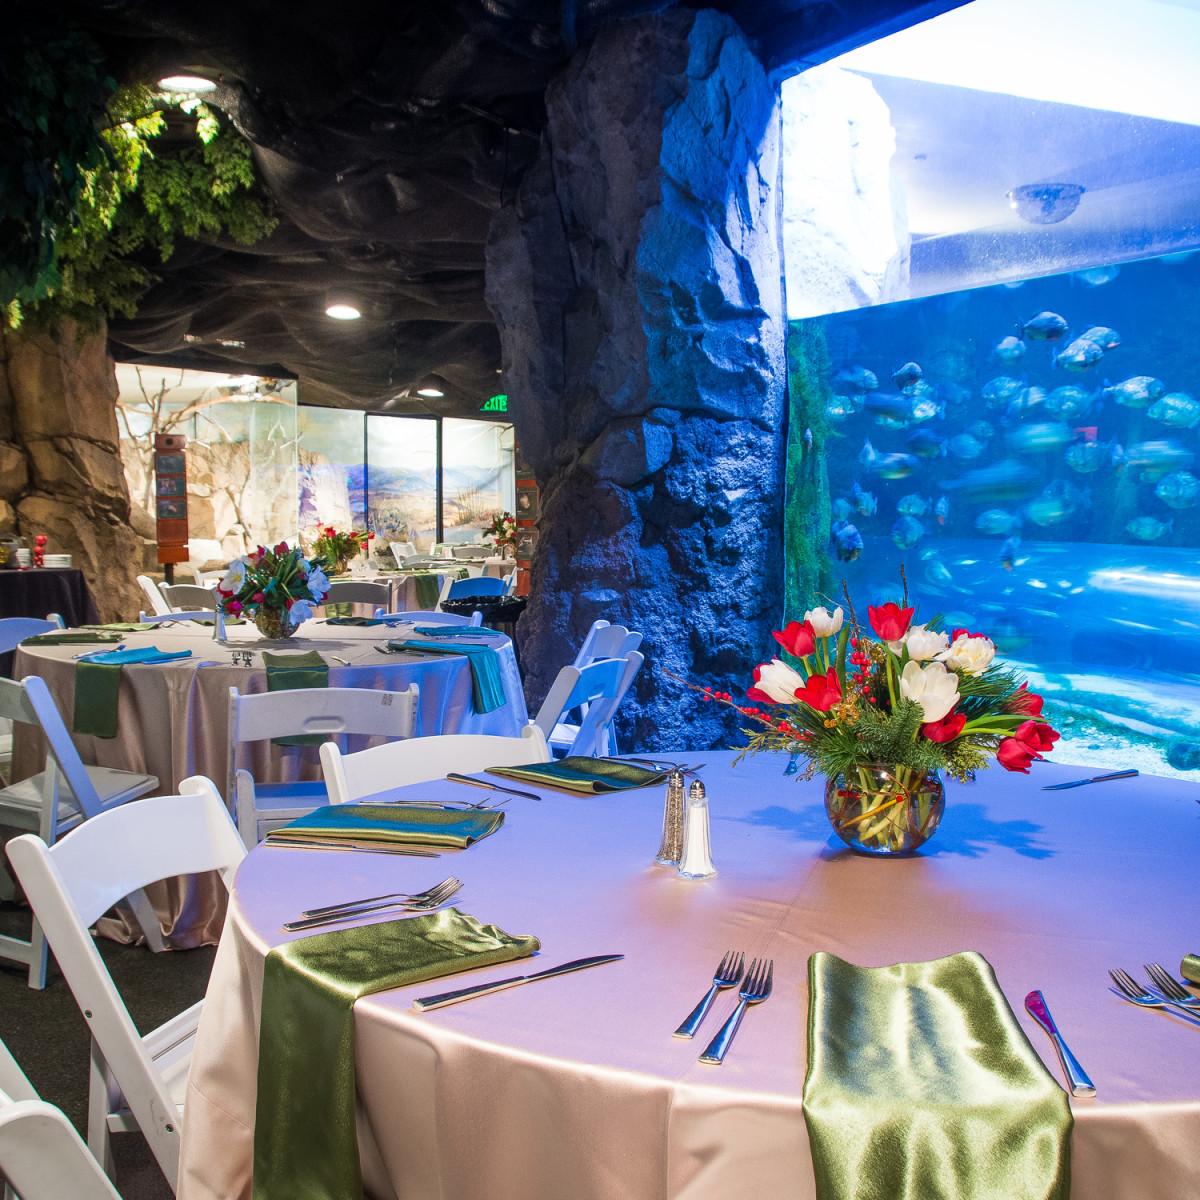 Houston Zoo, Under Sea Dinner, Feb. 2016